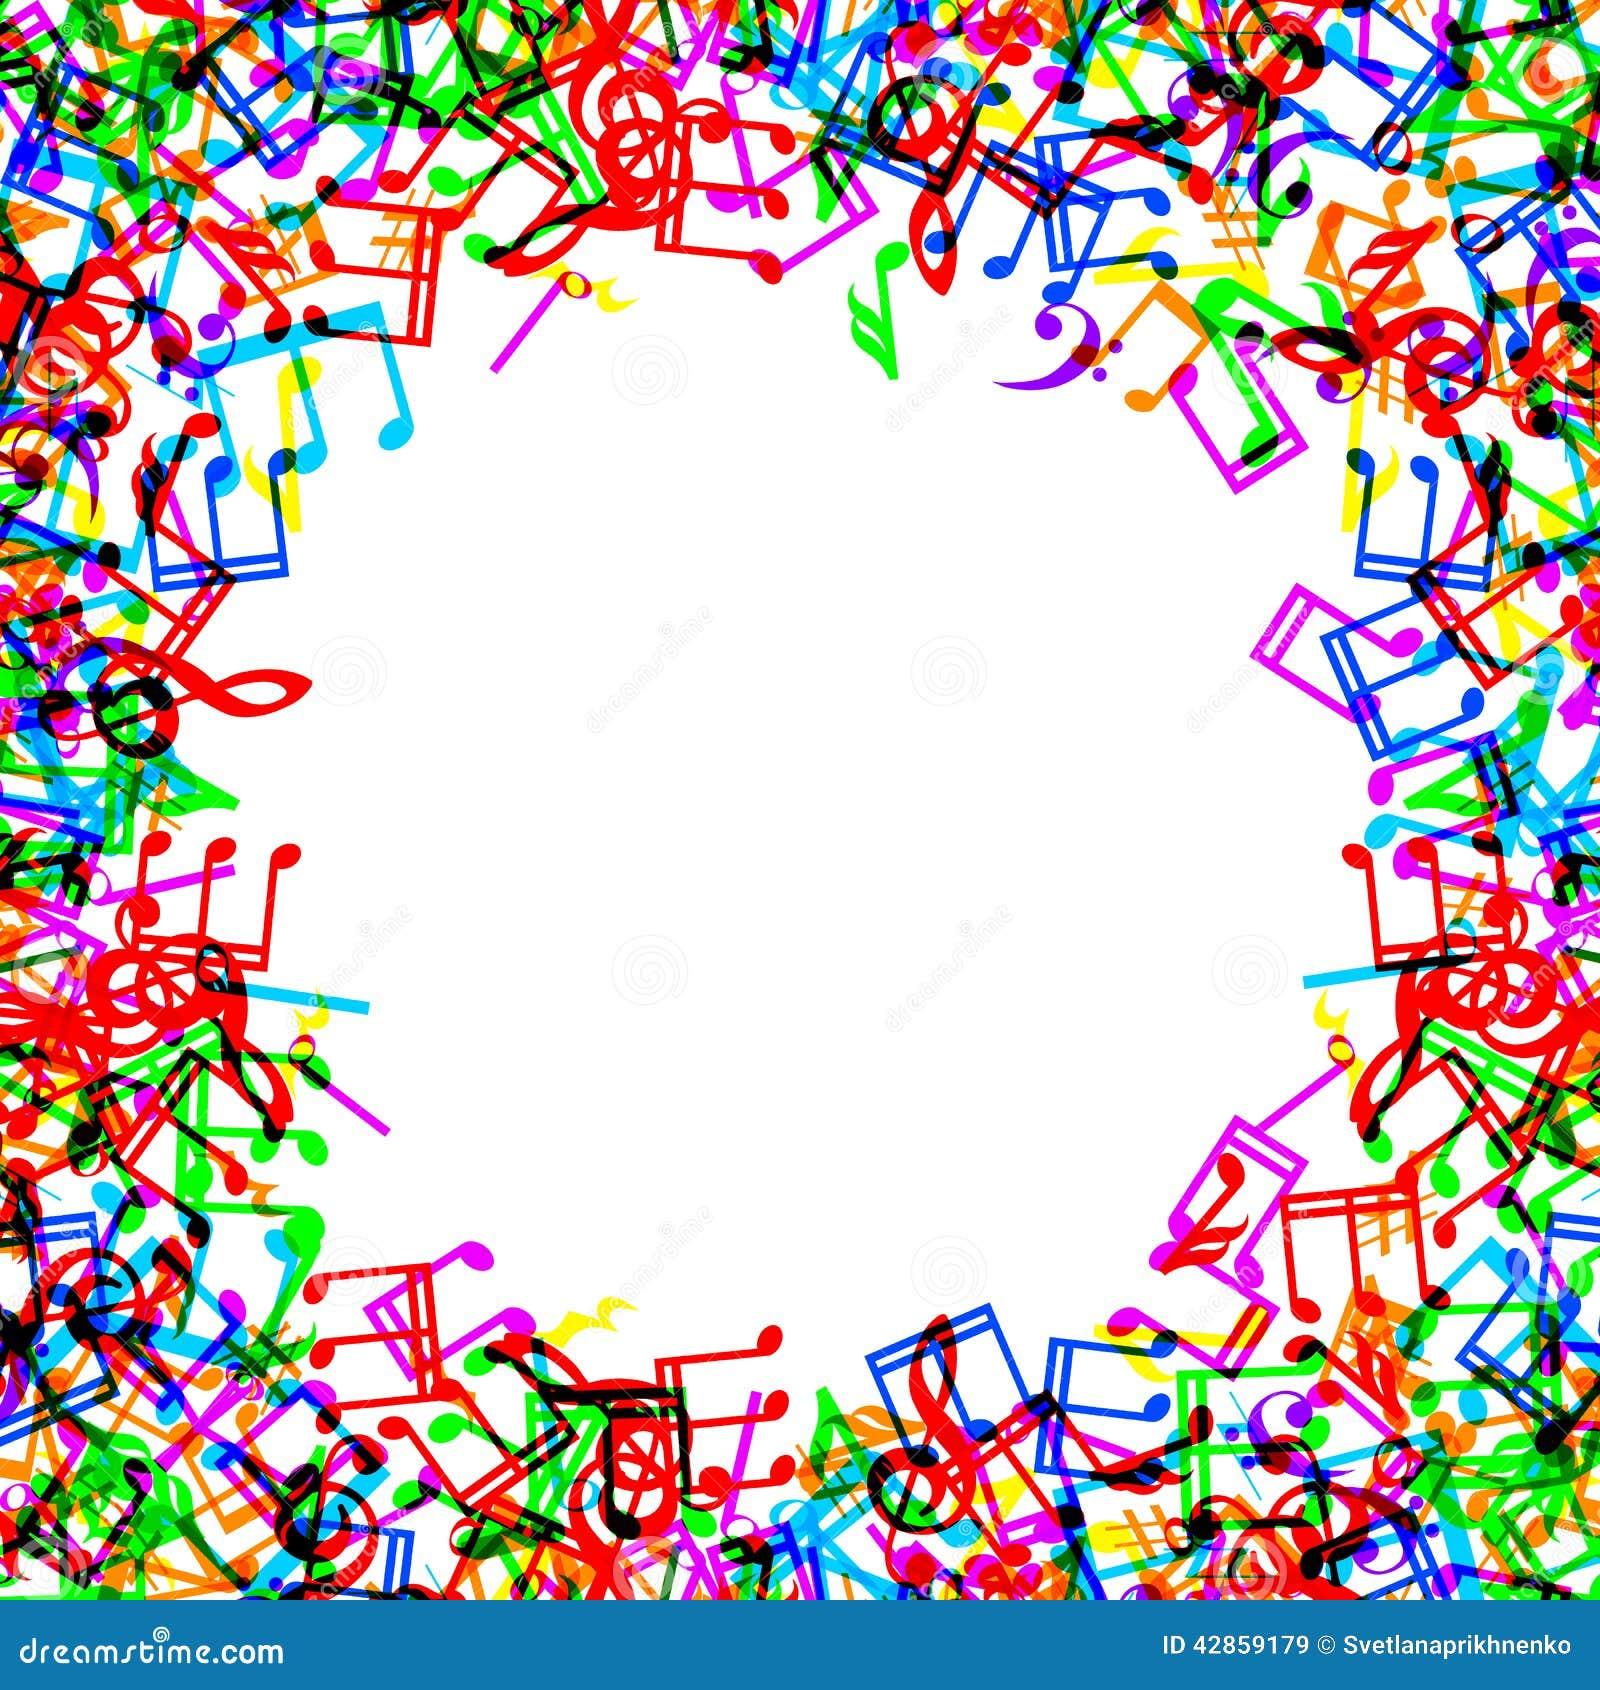 music notes border frame illustration 42859179 megapixl - Music Note Picture Frame